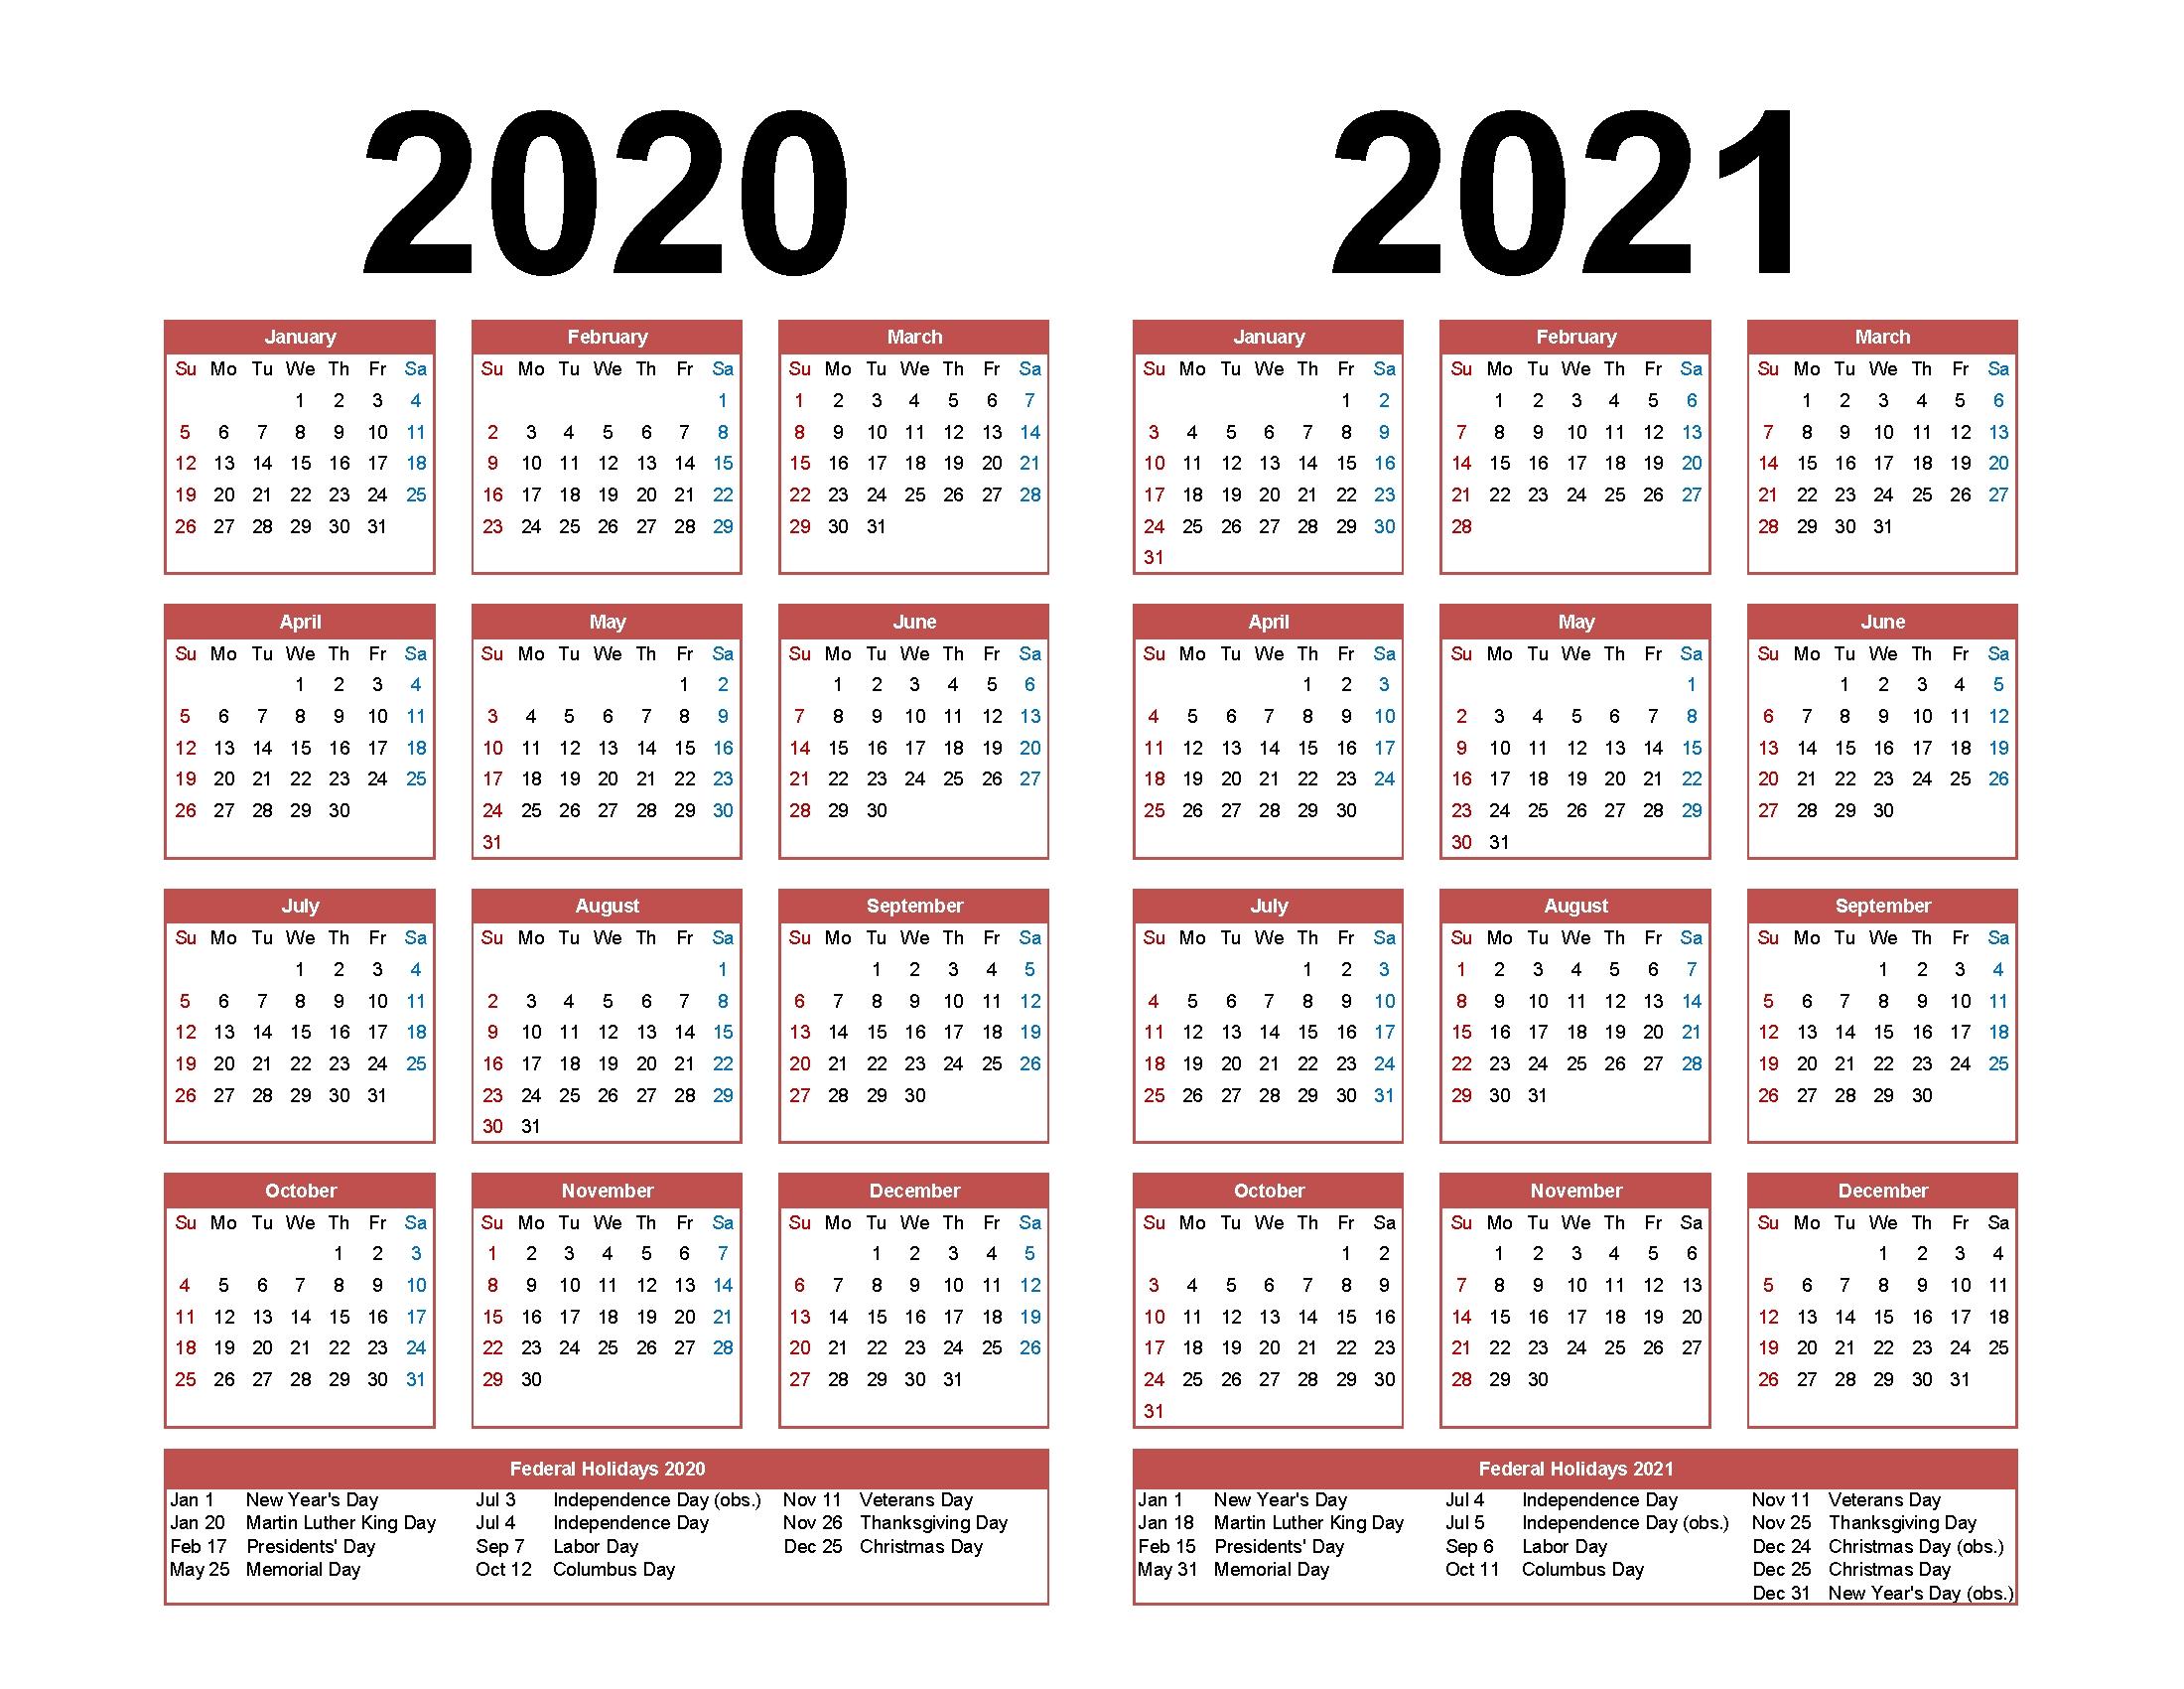 Printable Calendar 2020 2021 Two Year Per Page Free Pdf  Printable 12 Month 2020 2021 Calendar